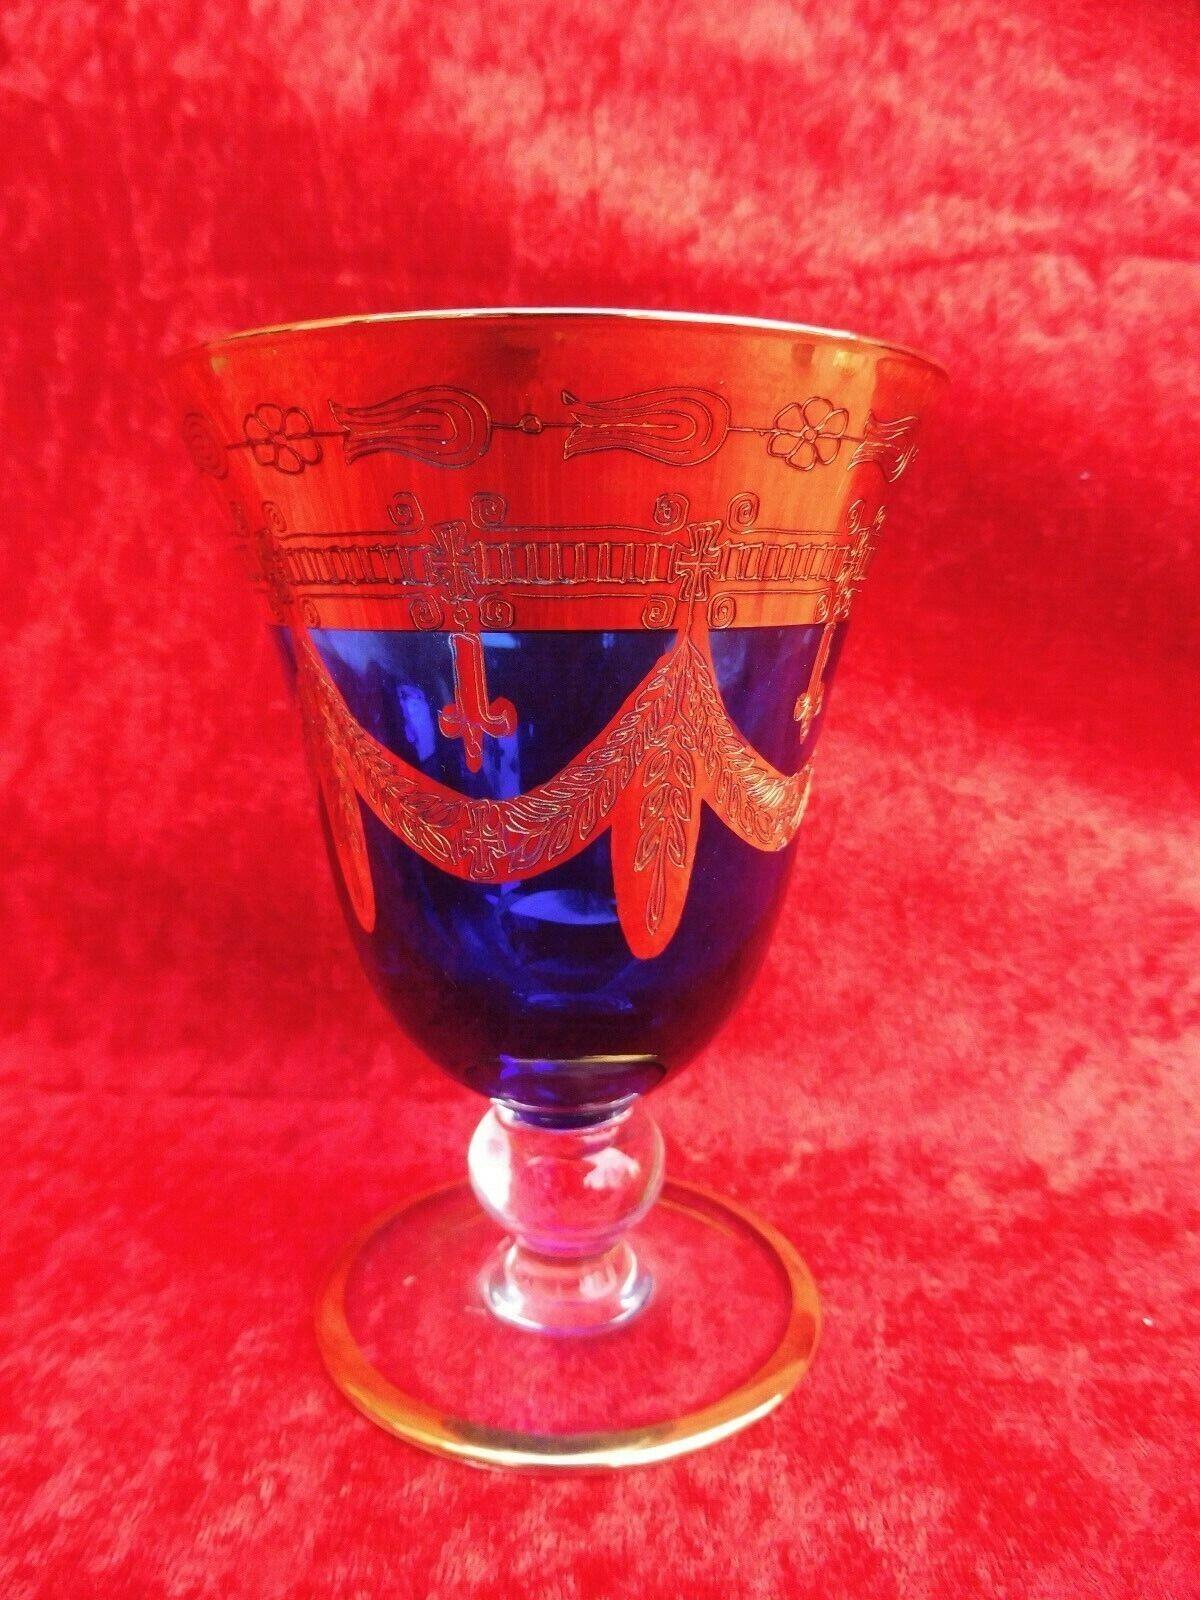 Noble Verre de vin __ interglass  __ Cristal Bleu Marine __ 24k-or __ rougeweinglas